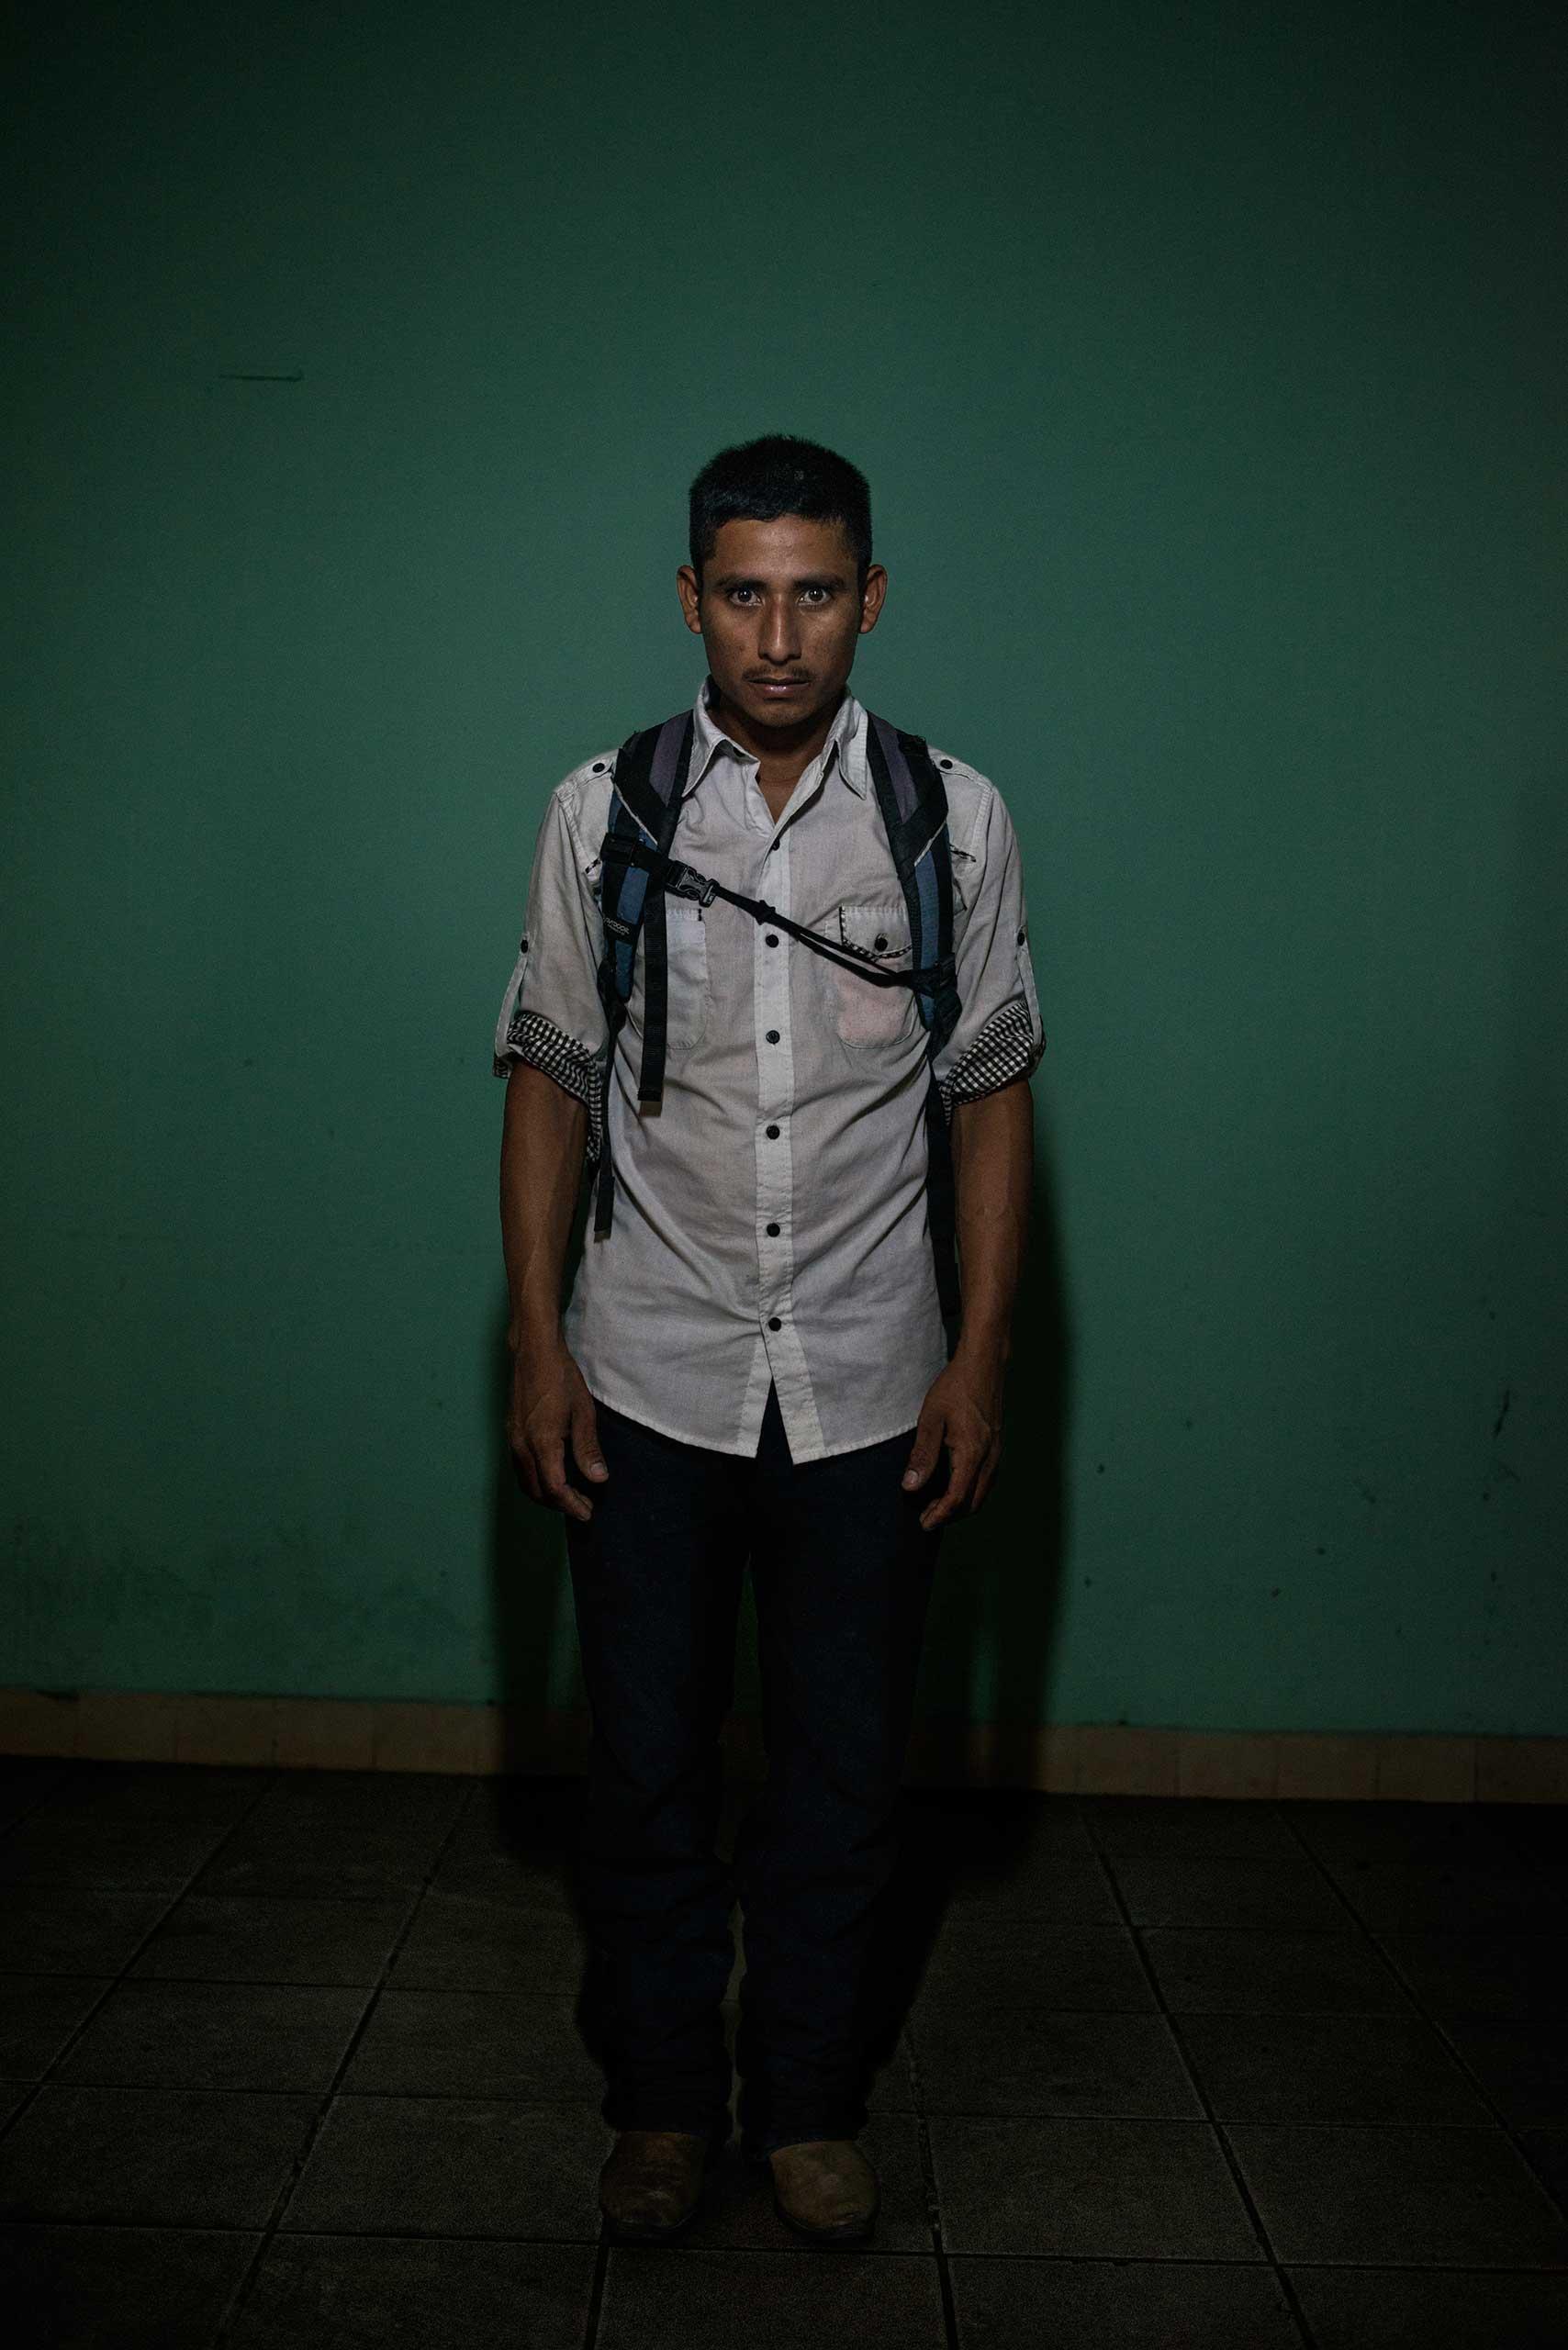 Ariel Mejia, 22, from Guatemala.